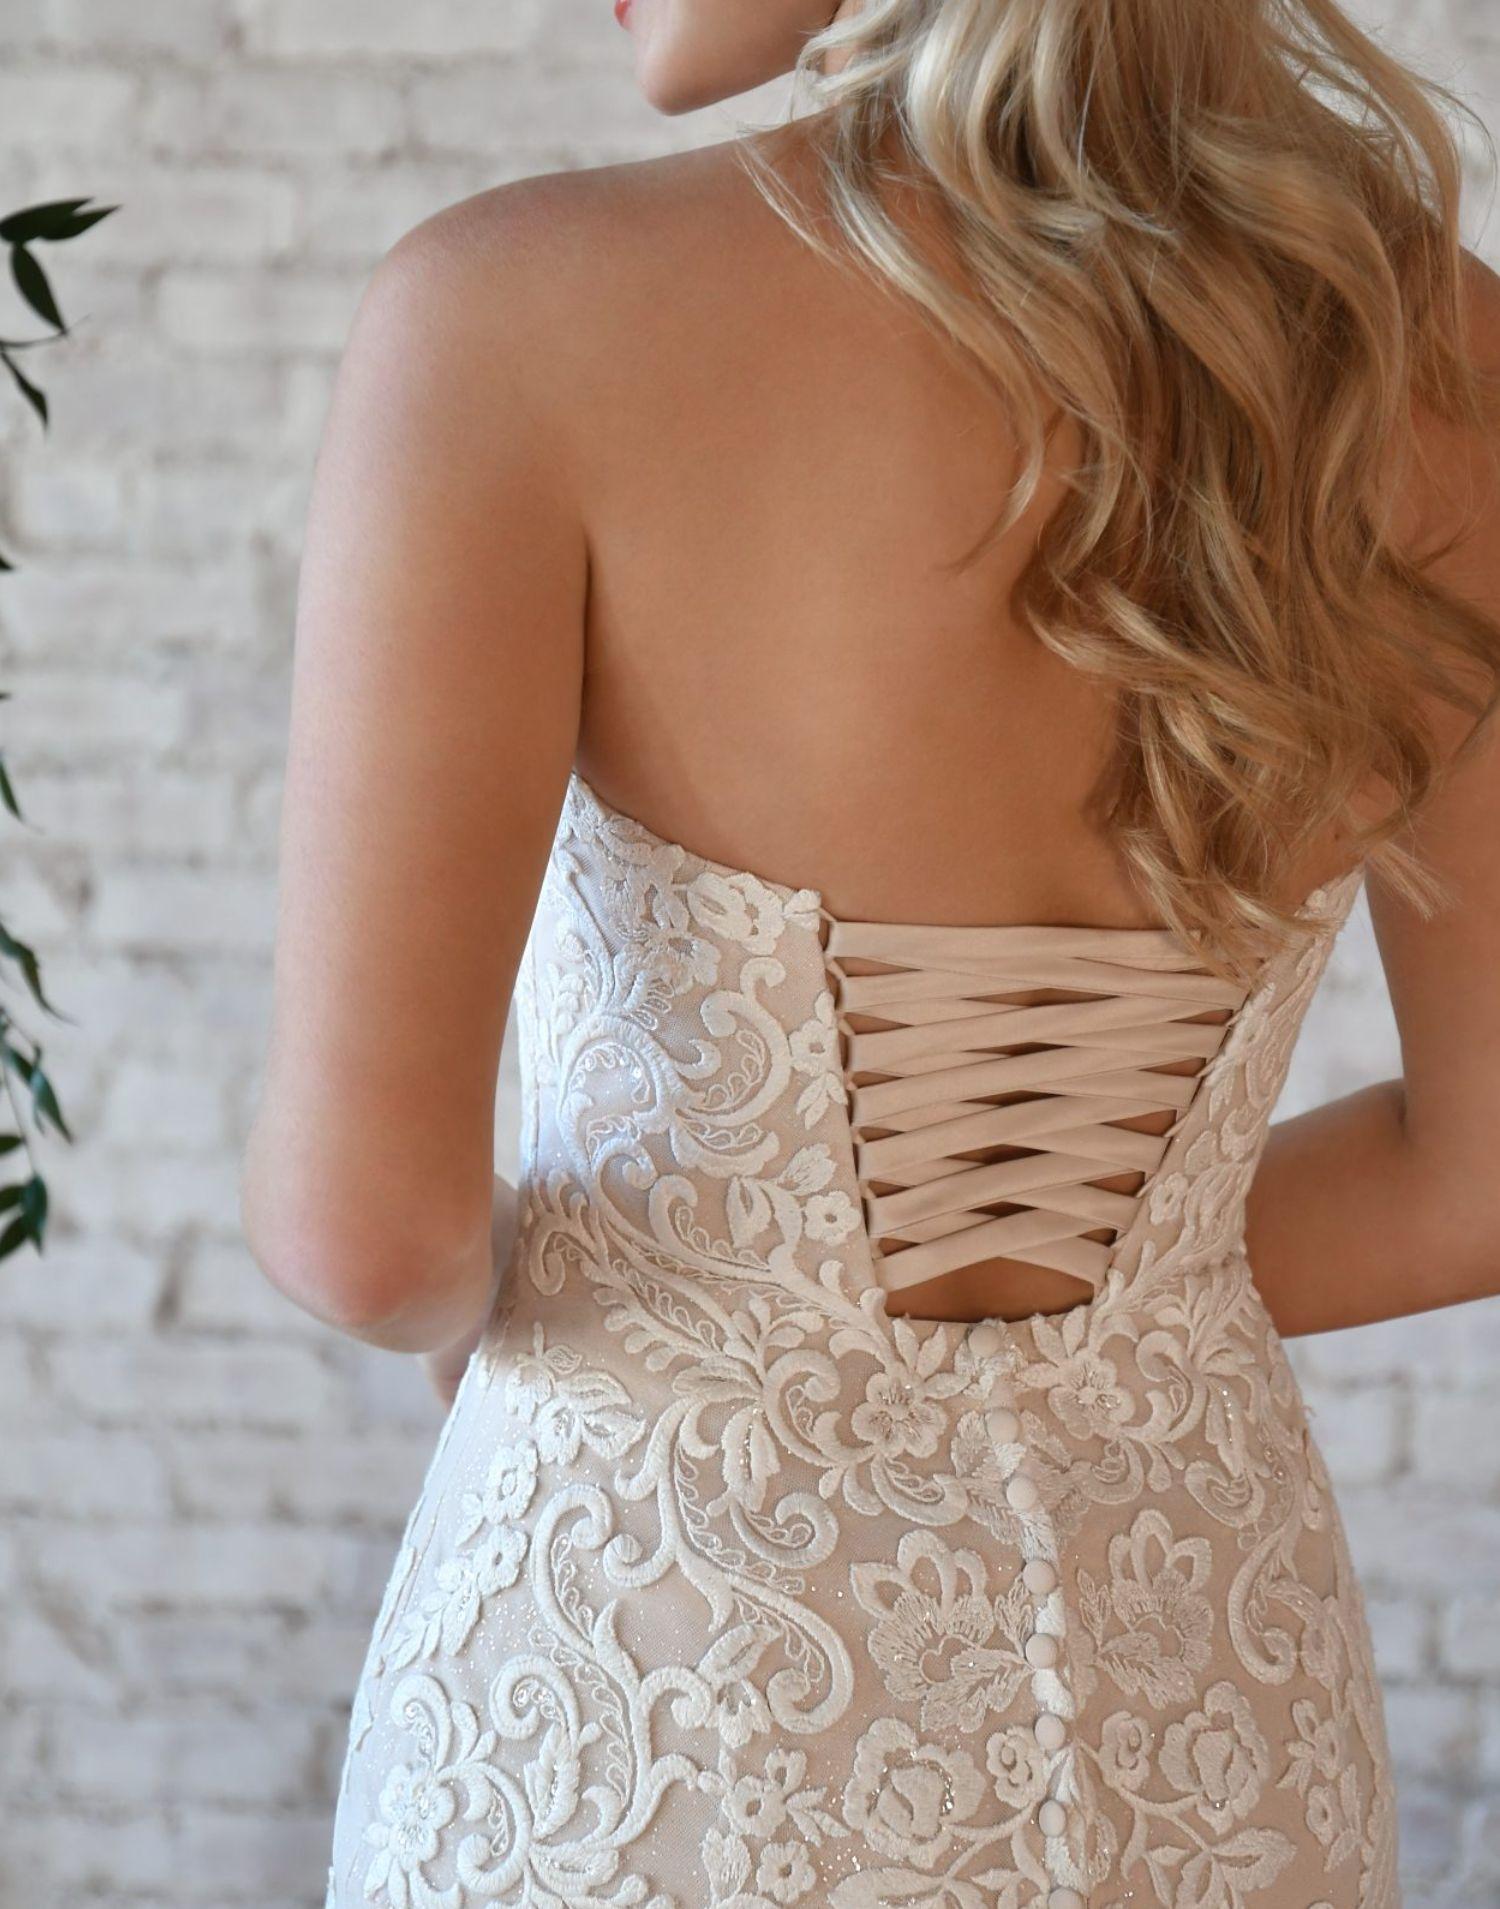 Modern Mermaid Wedding Dress From Stella York – 7323 – Front View